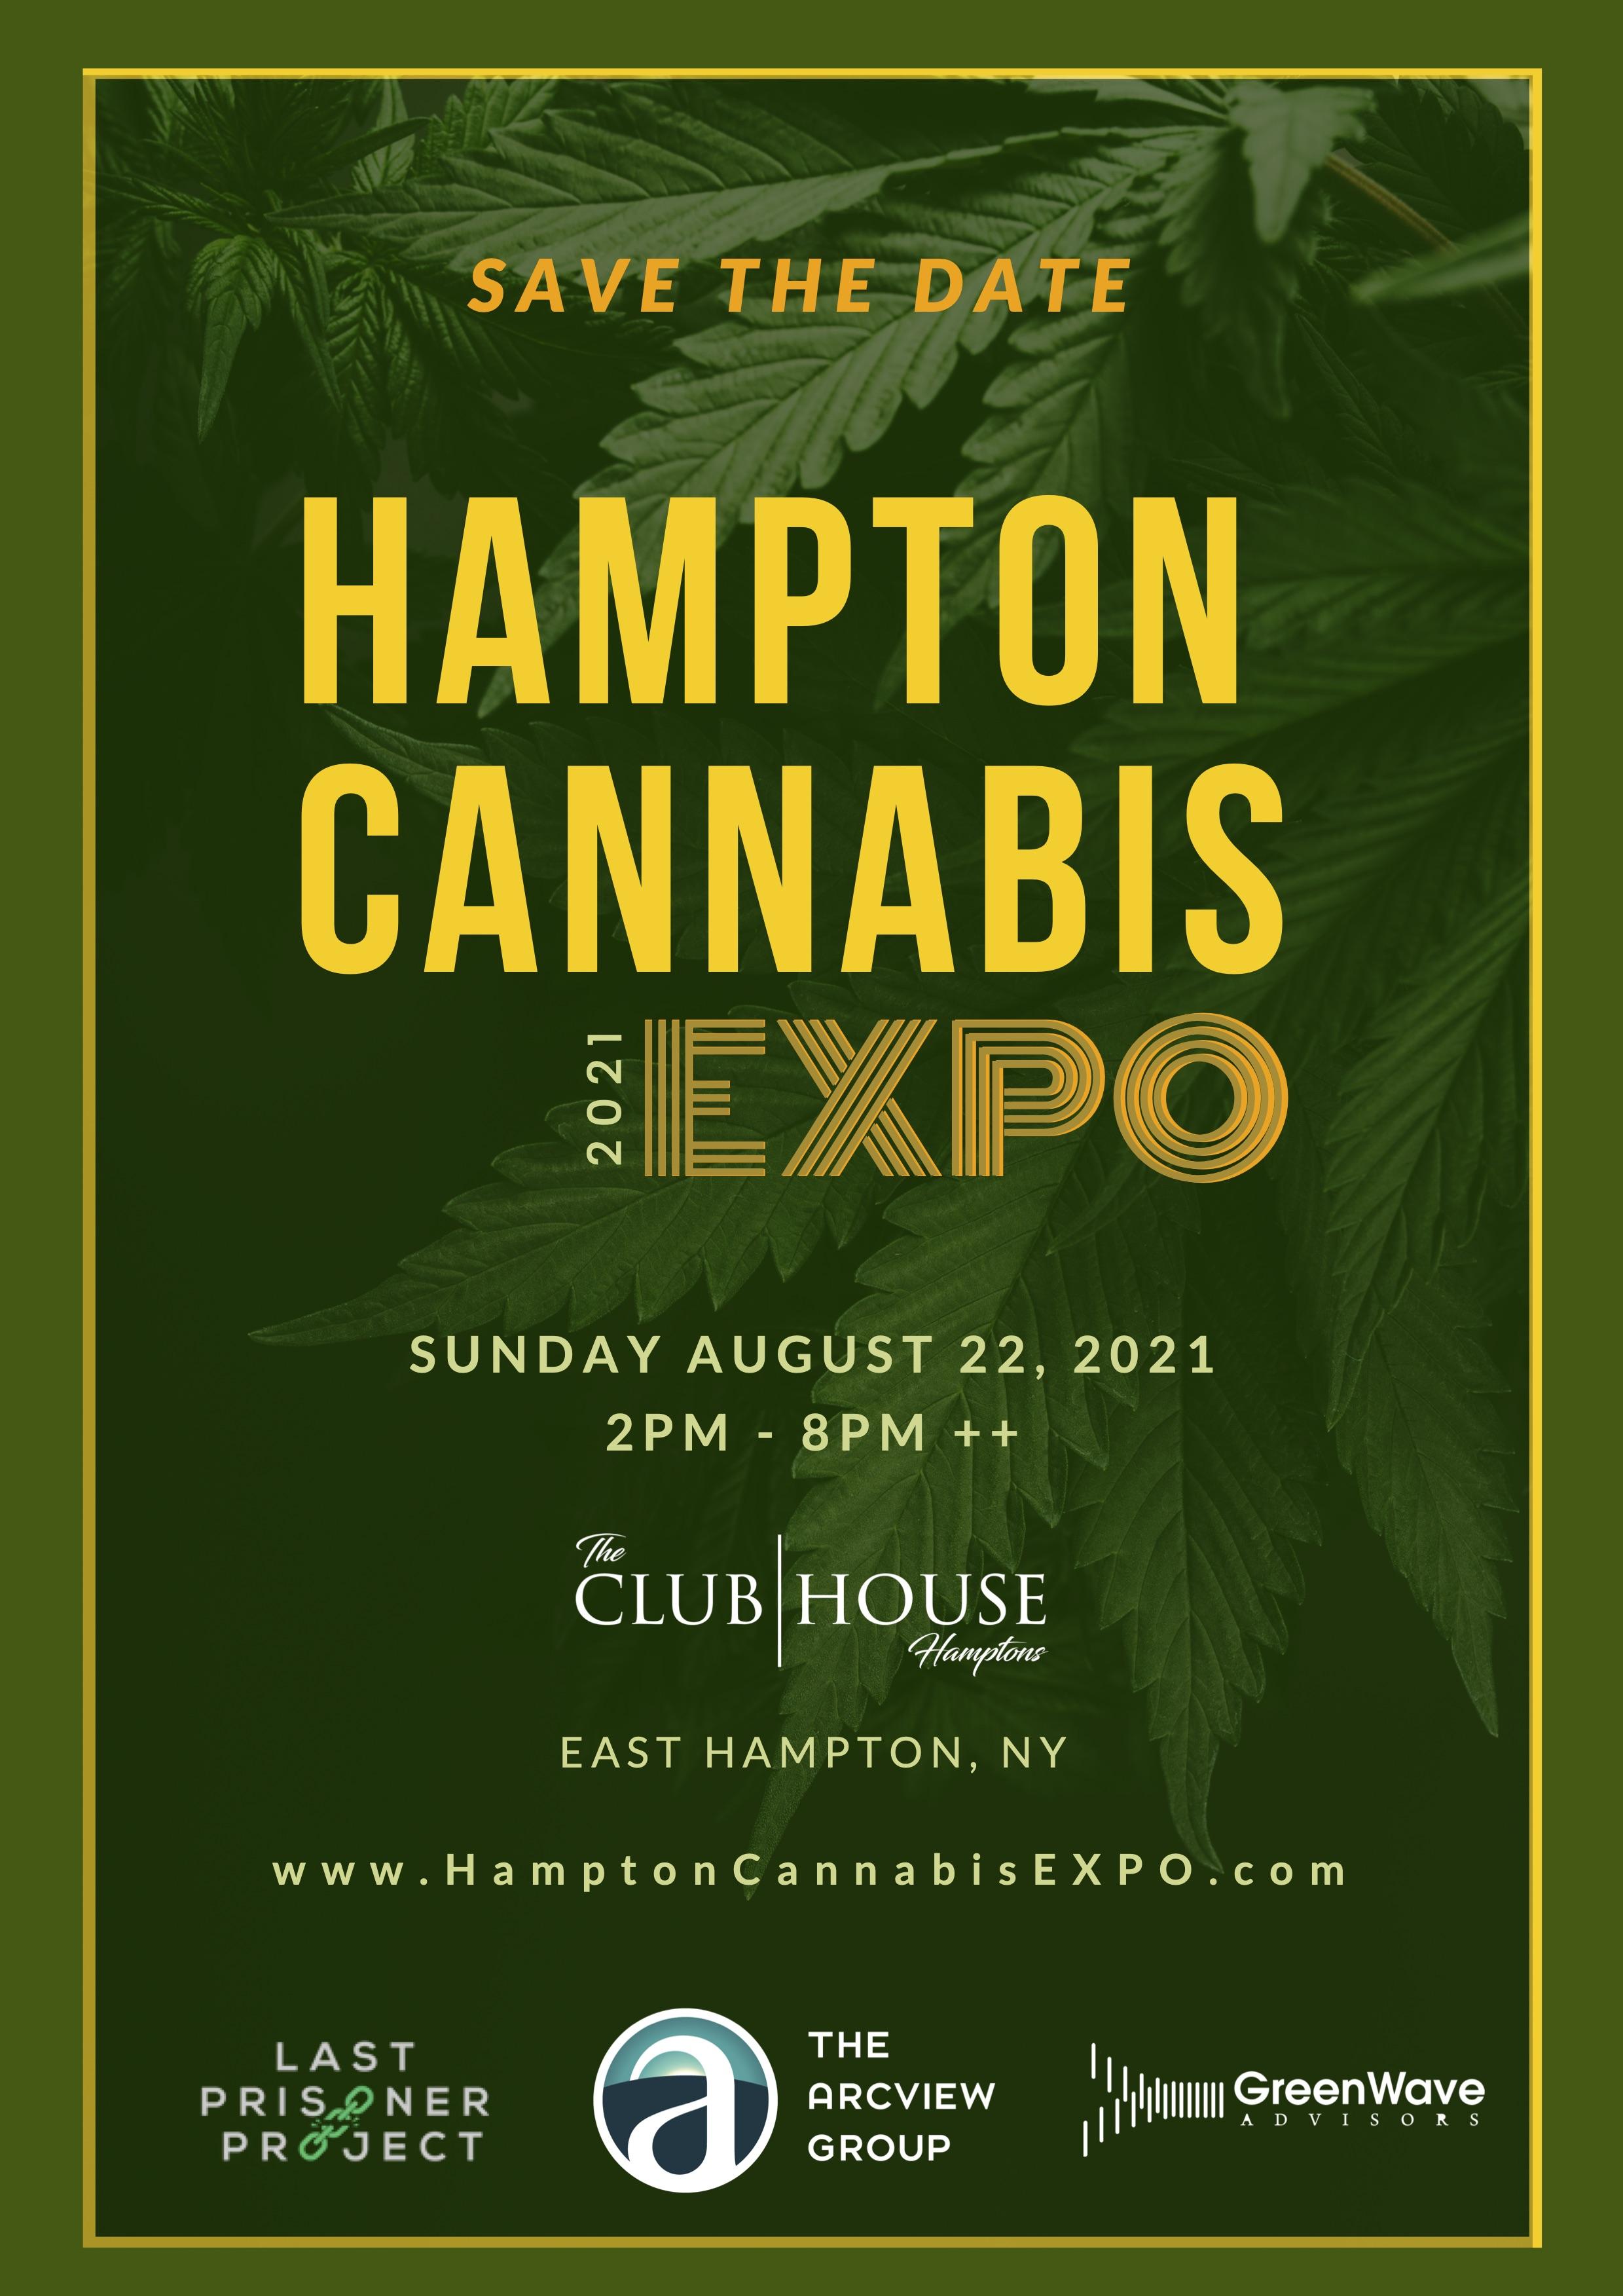 Hamptons Cannabis Expo 2021: Main Image